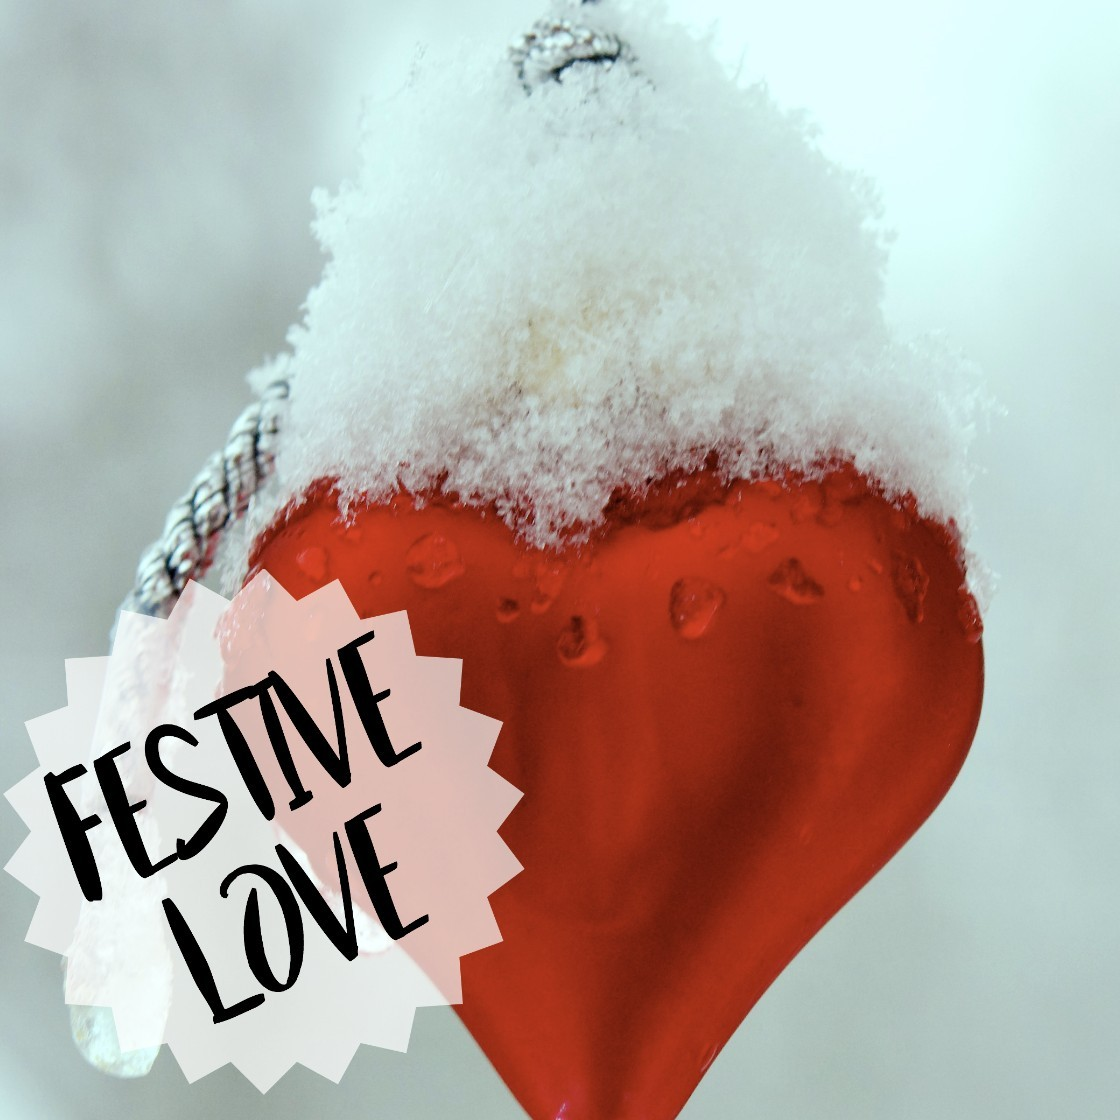 Festive Love, Festive, Love, BlogMas, Christmas, Blog Post, Heart, Snow, Flickr, Loneliness, Lonely, Festive Season, Share the Love, Blog A Book Etc, Fay